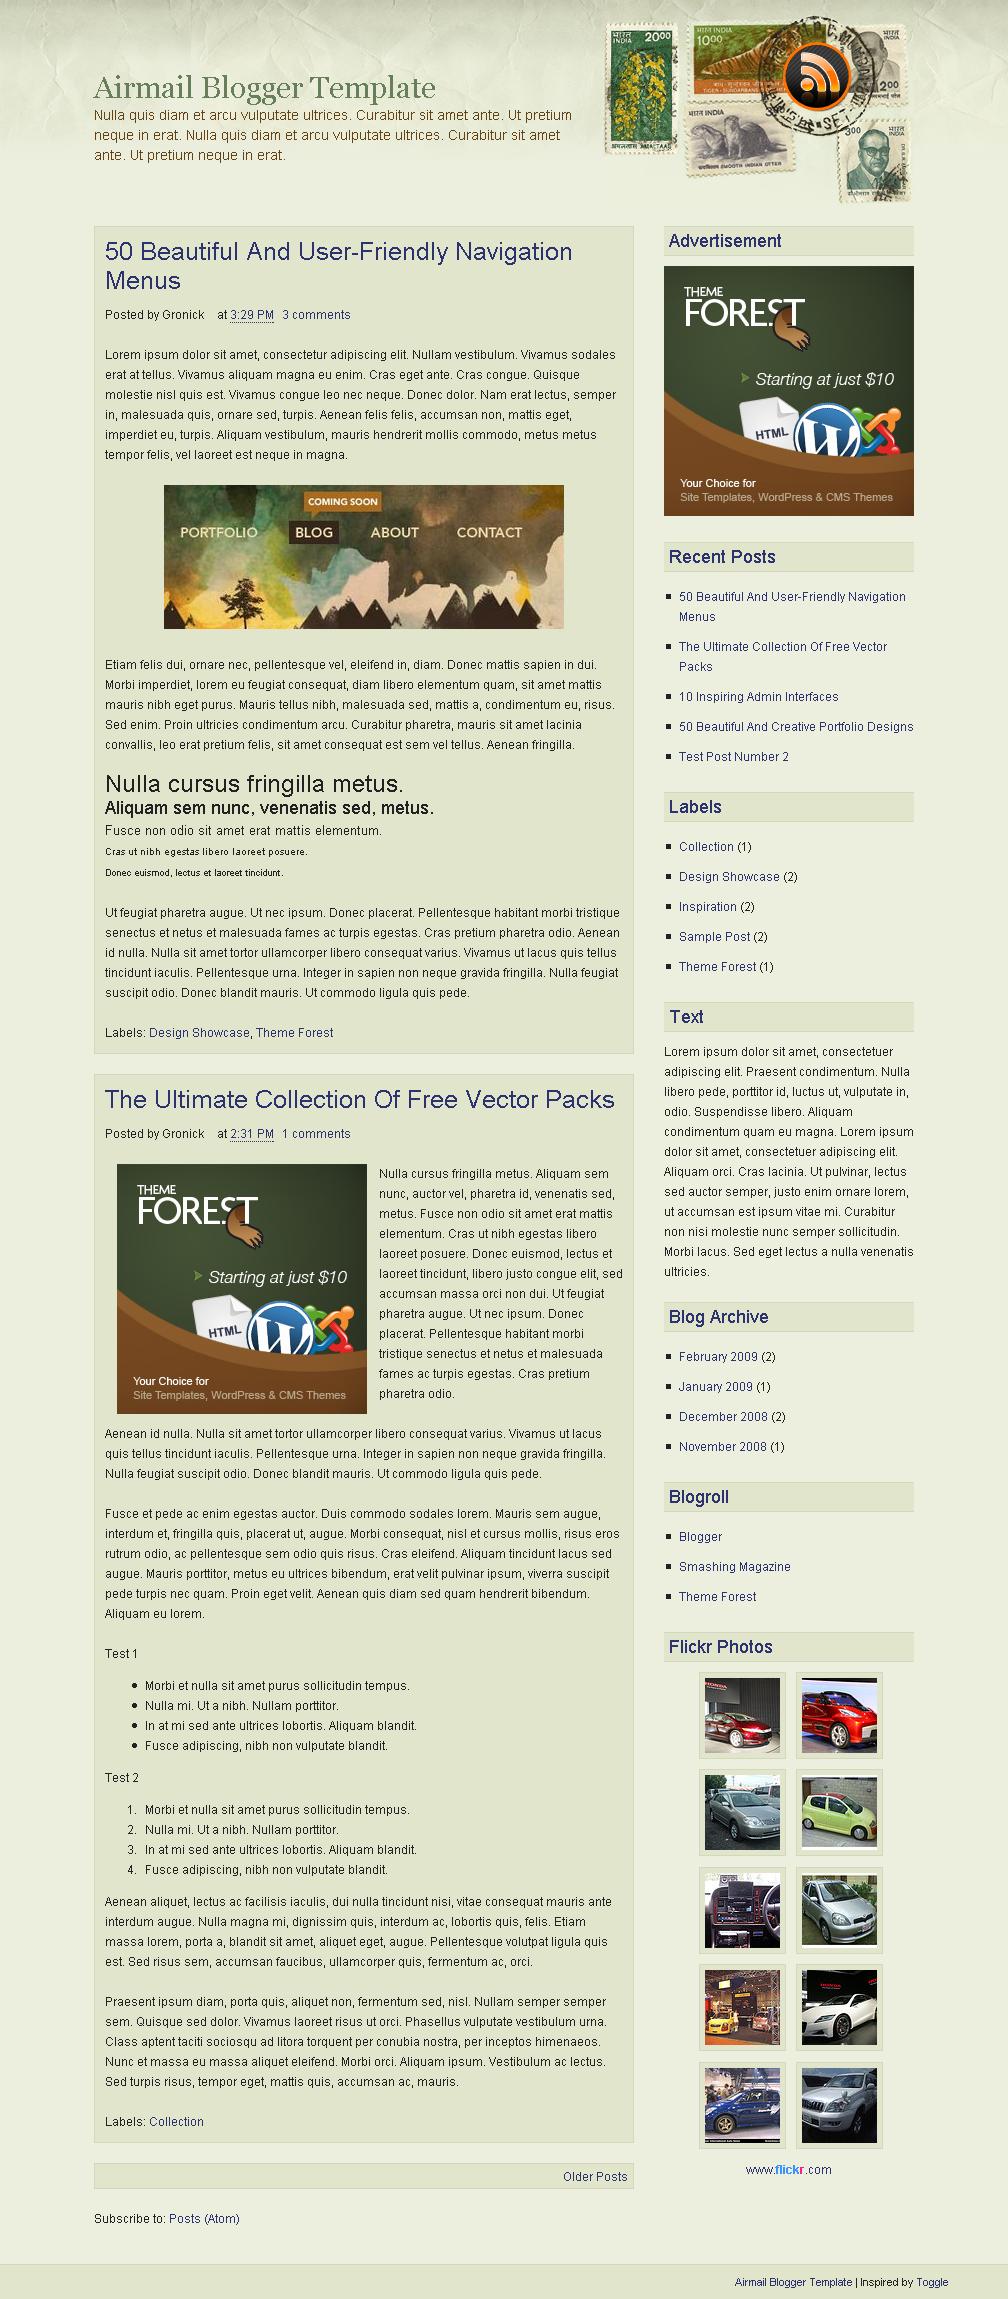 http://3.s3.envato.com/files/80660/screenshots/1_Homepage.png